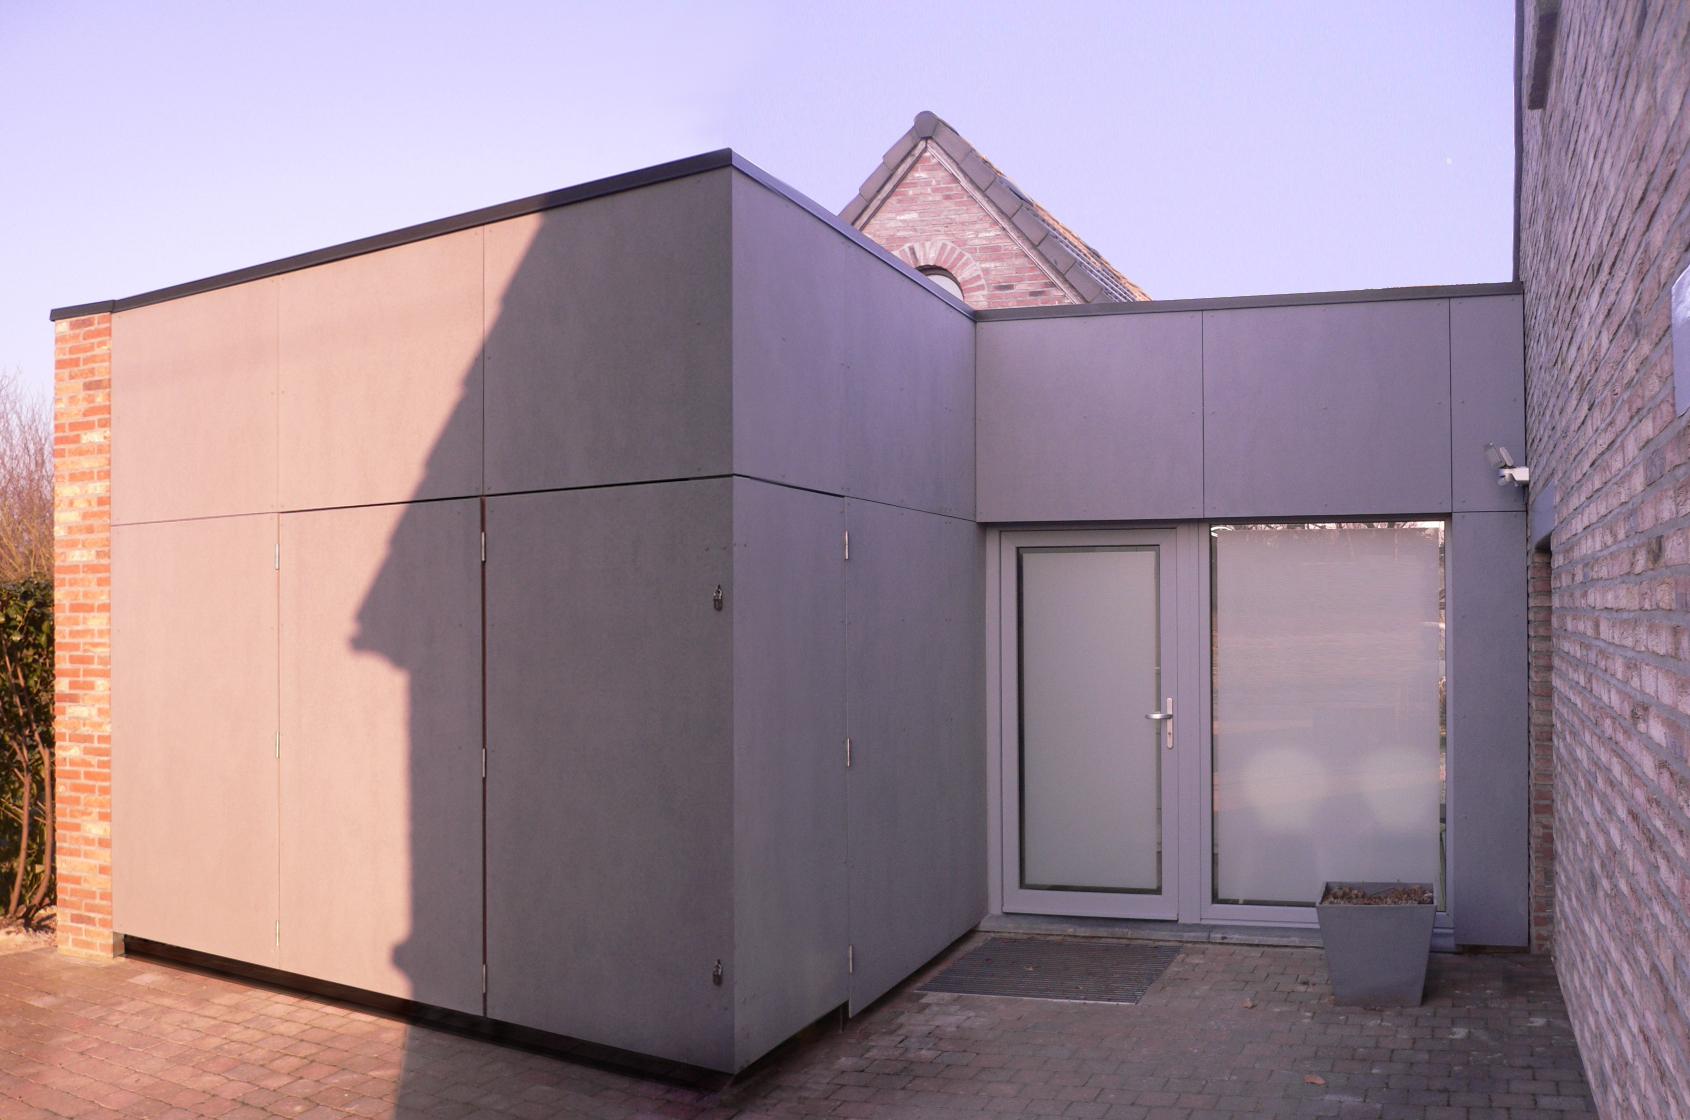 Architecte namur architecture namur architecture corbacreative